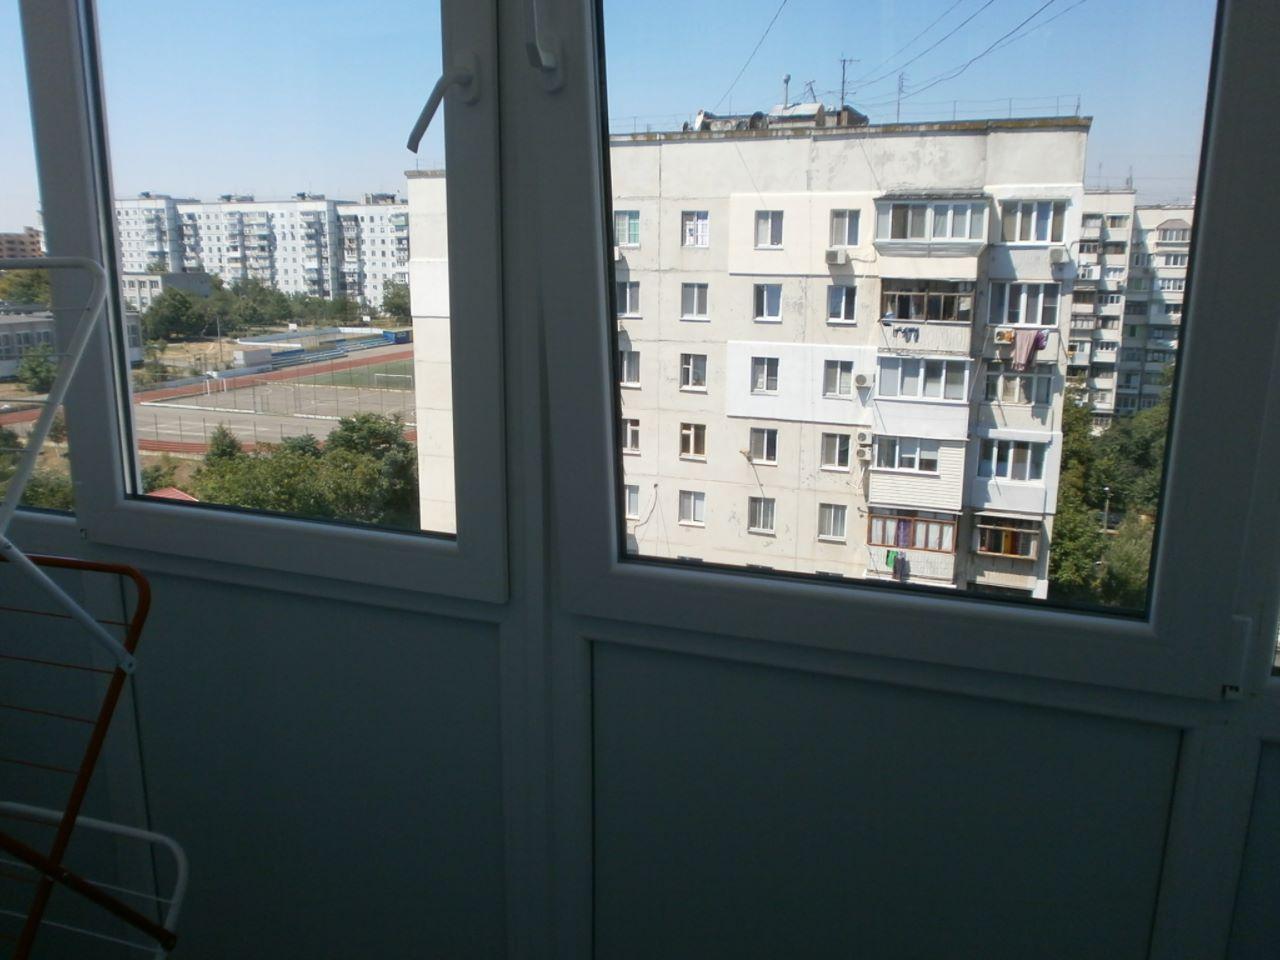 Продается 1-комнатная квартира на ул. Парковая — 36 000 у.е. (фото №3)